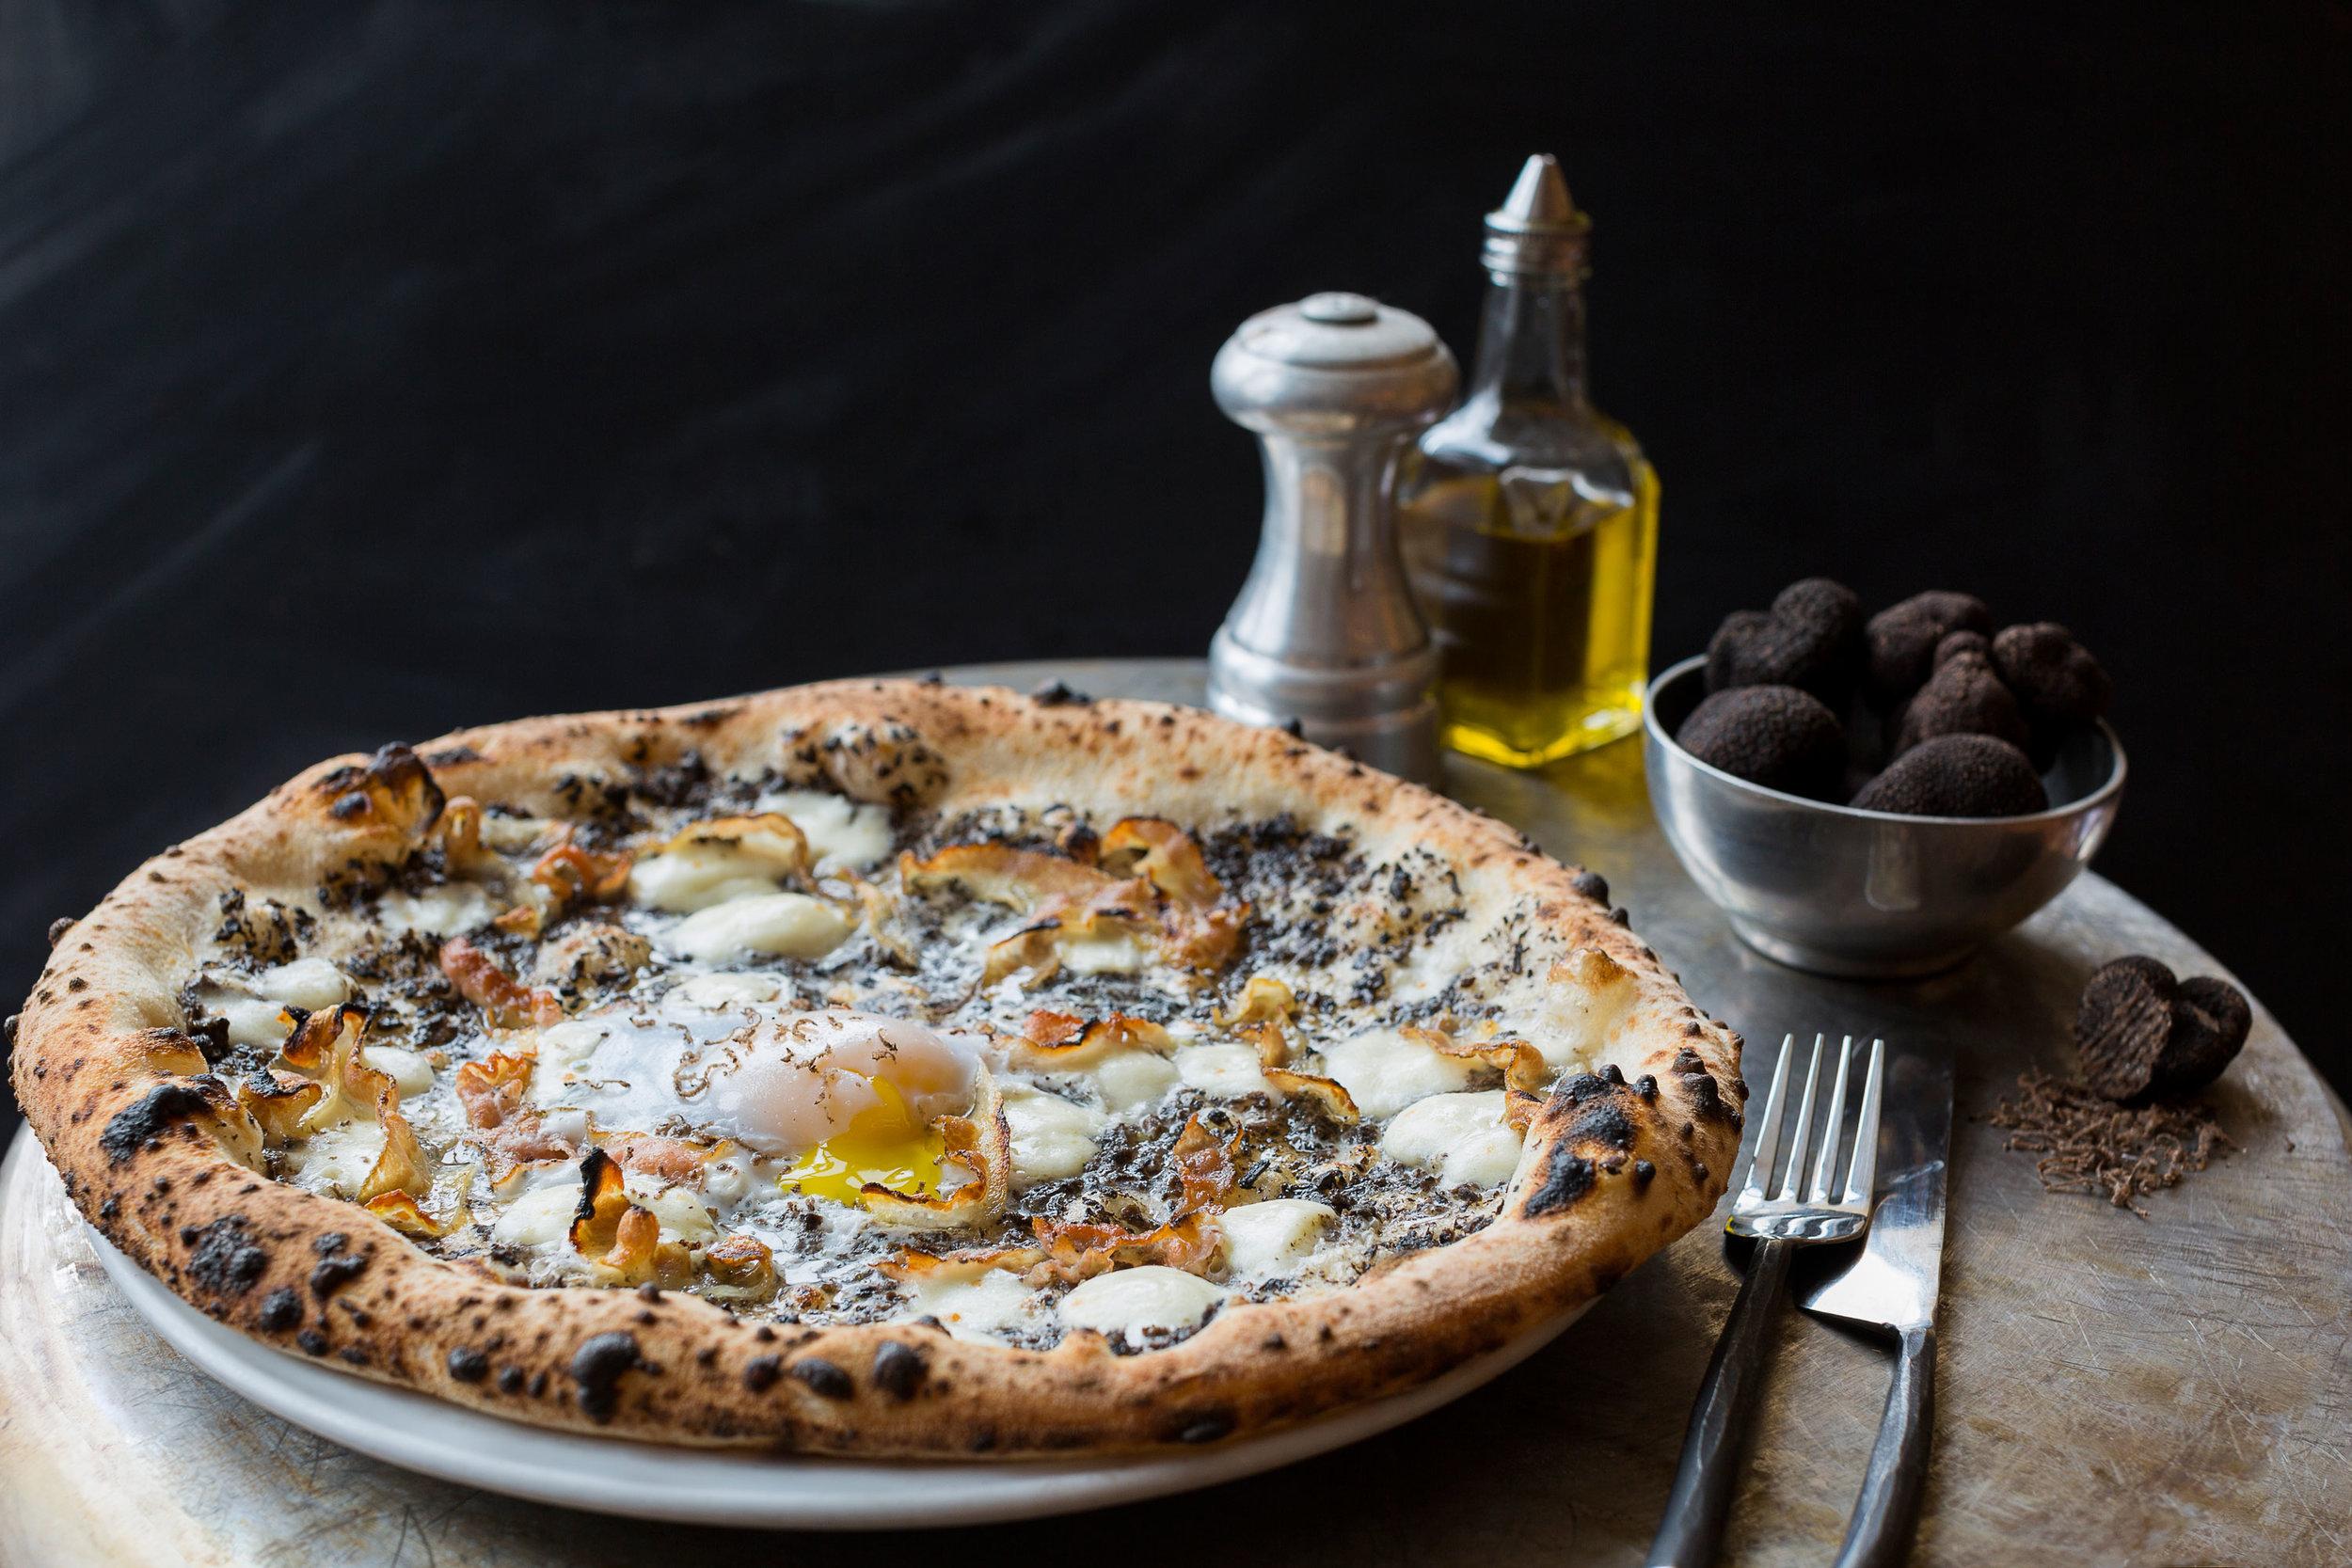 SpaccaNapoli_Food13796.jpg